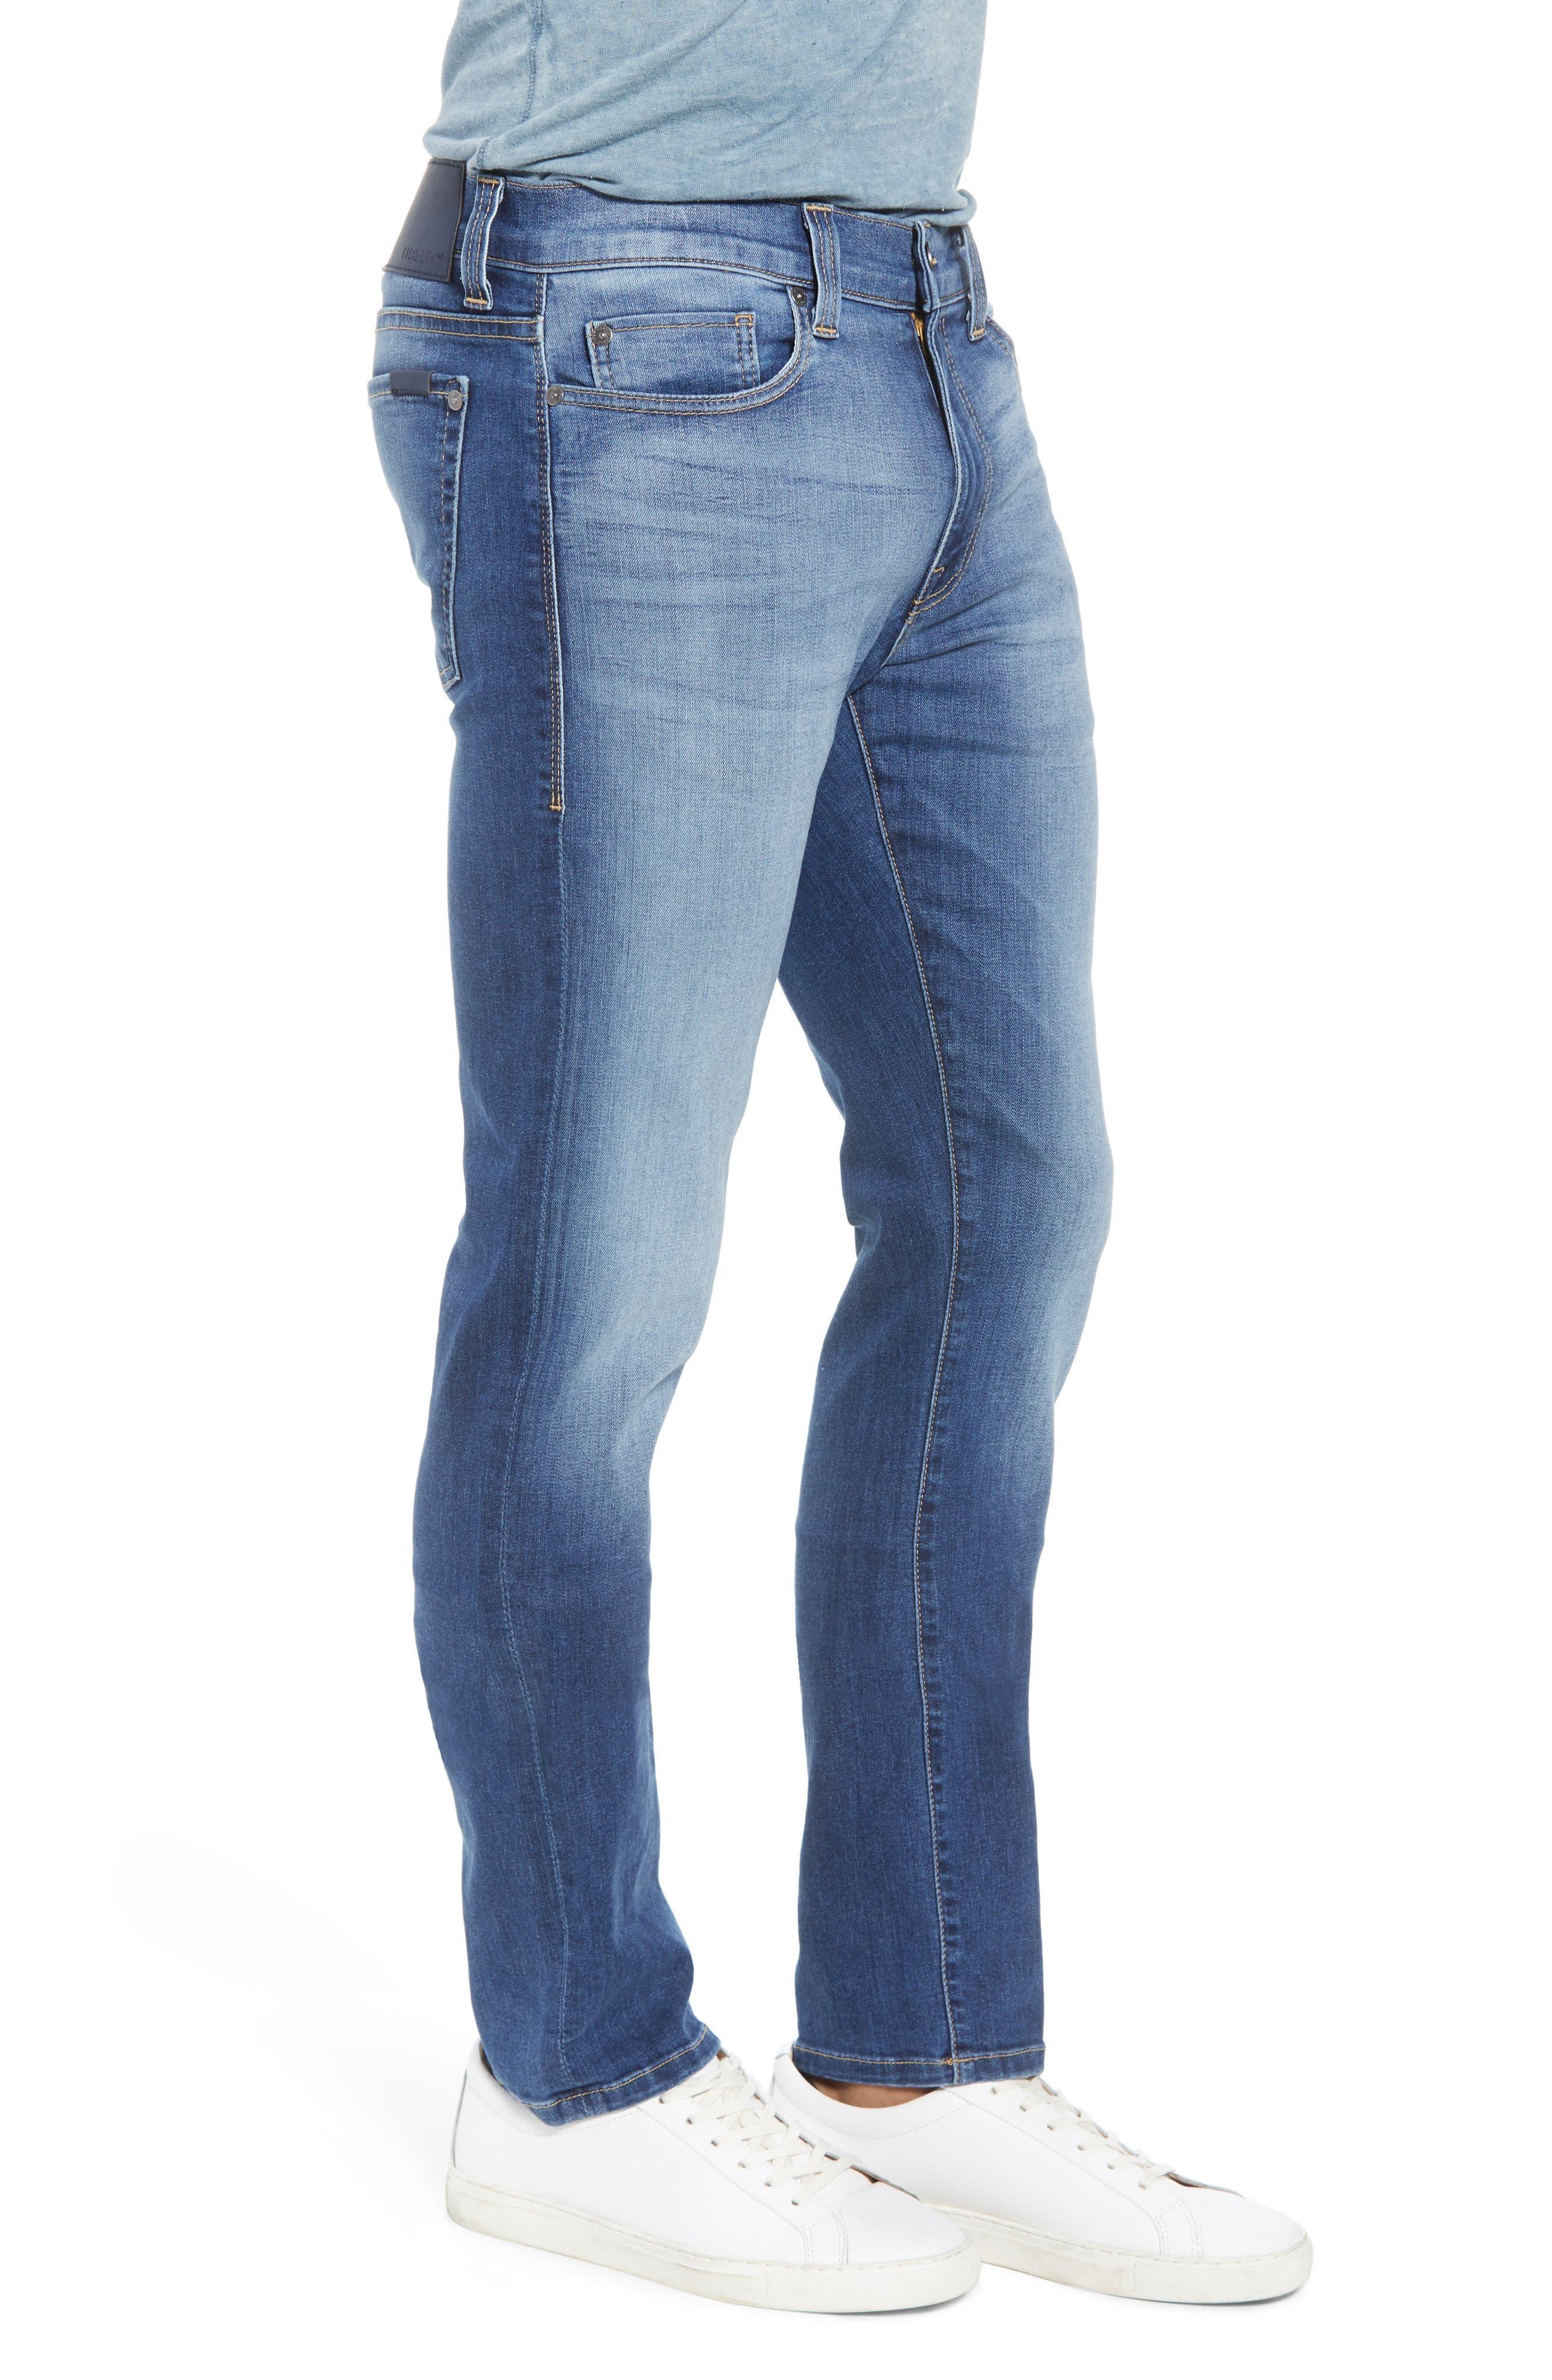 Torino Slim Fit Jeans,                             Alternate thumbnail 3, color,                             Elysium Blue